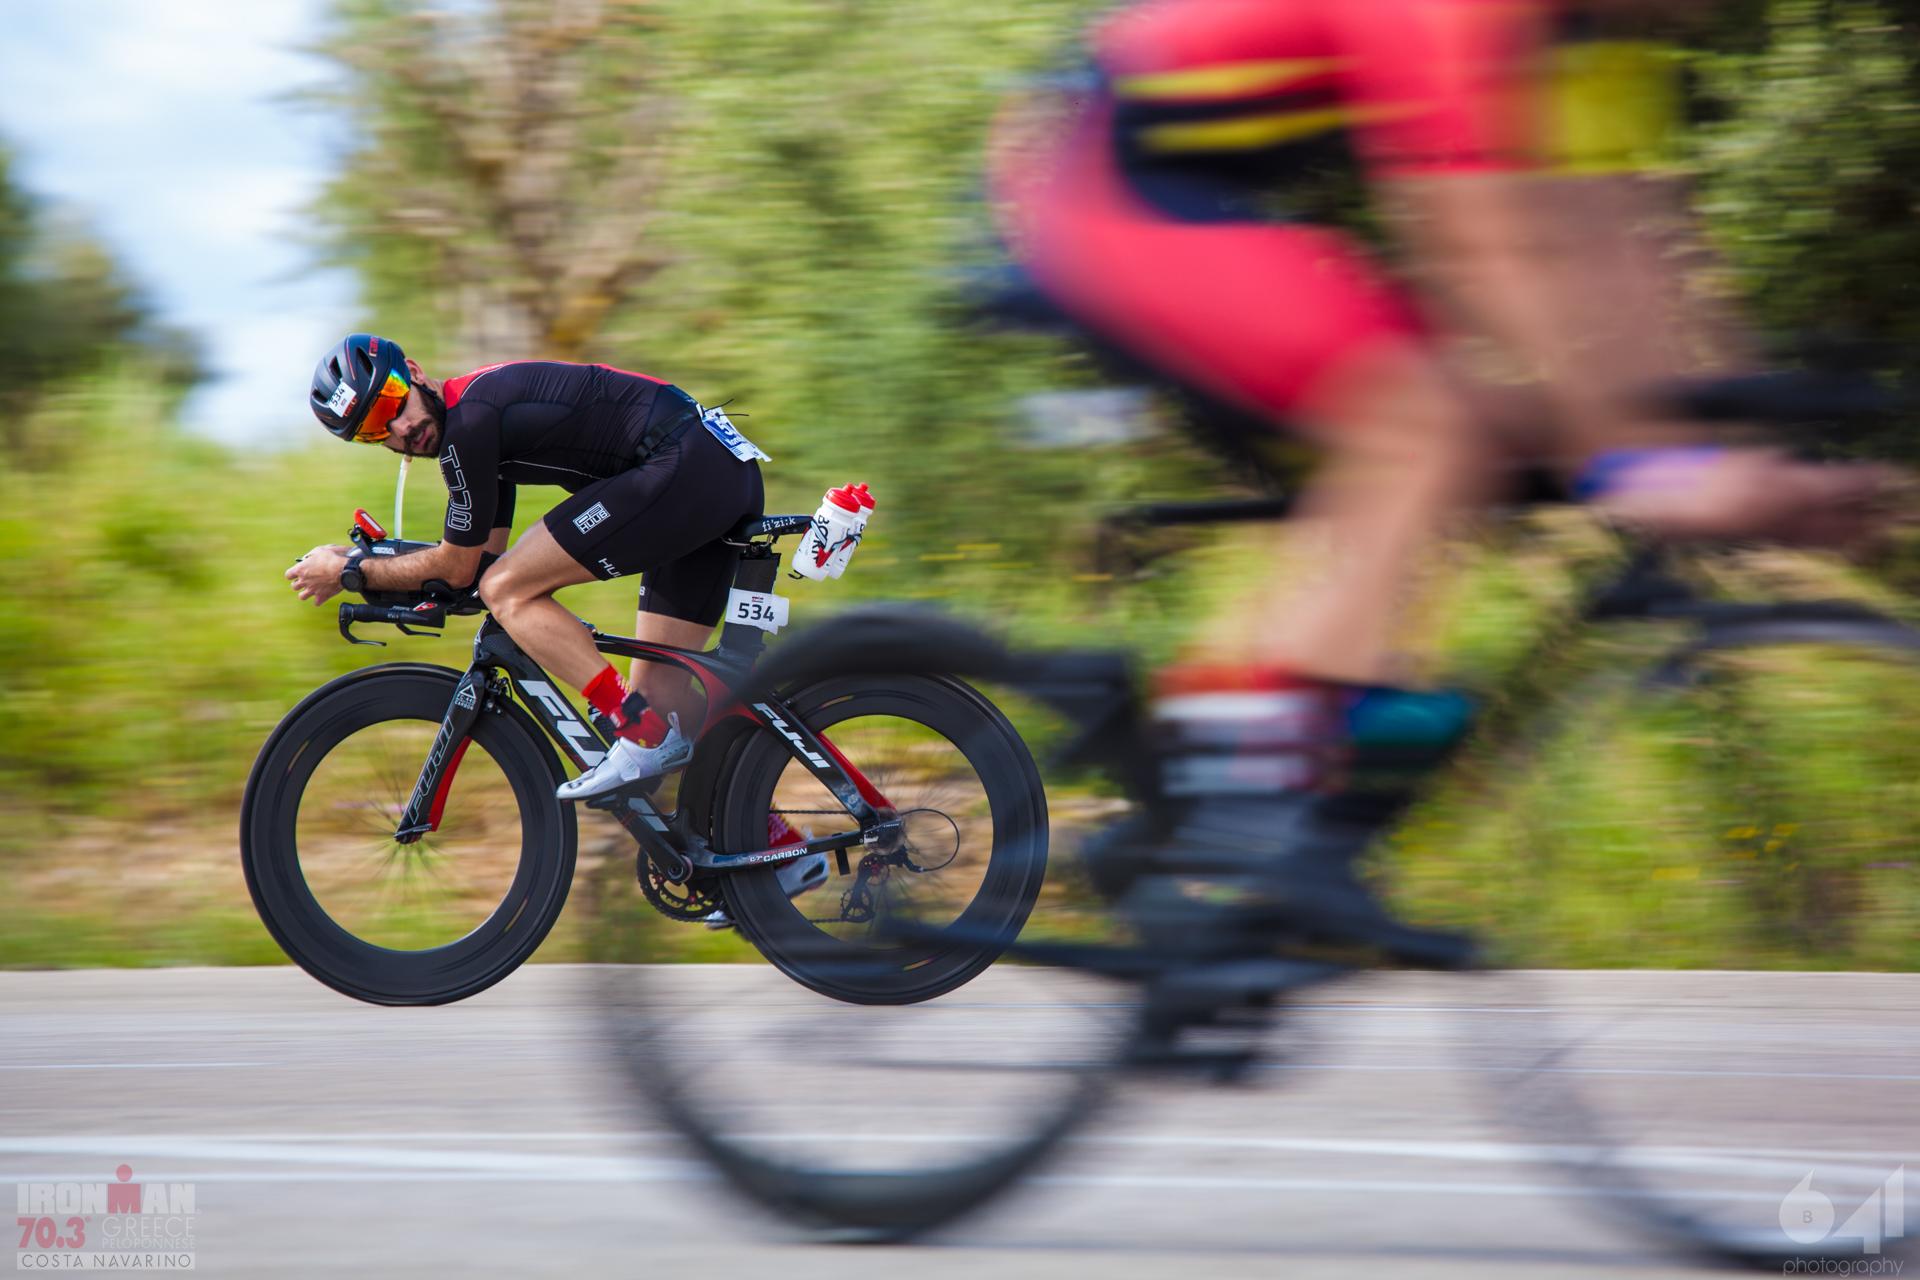 90 km bike ride